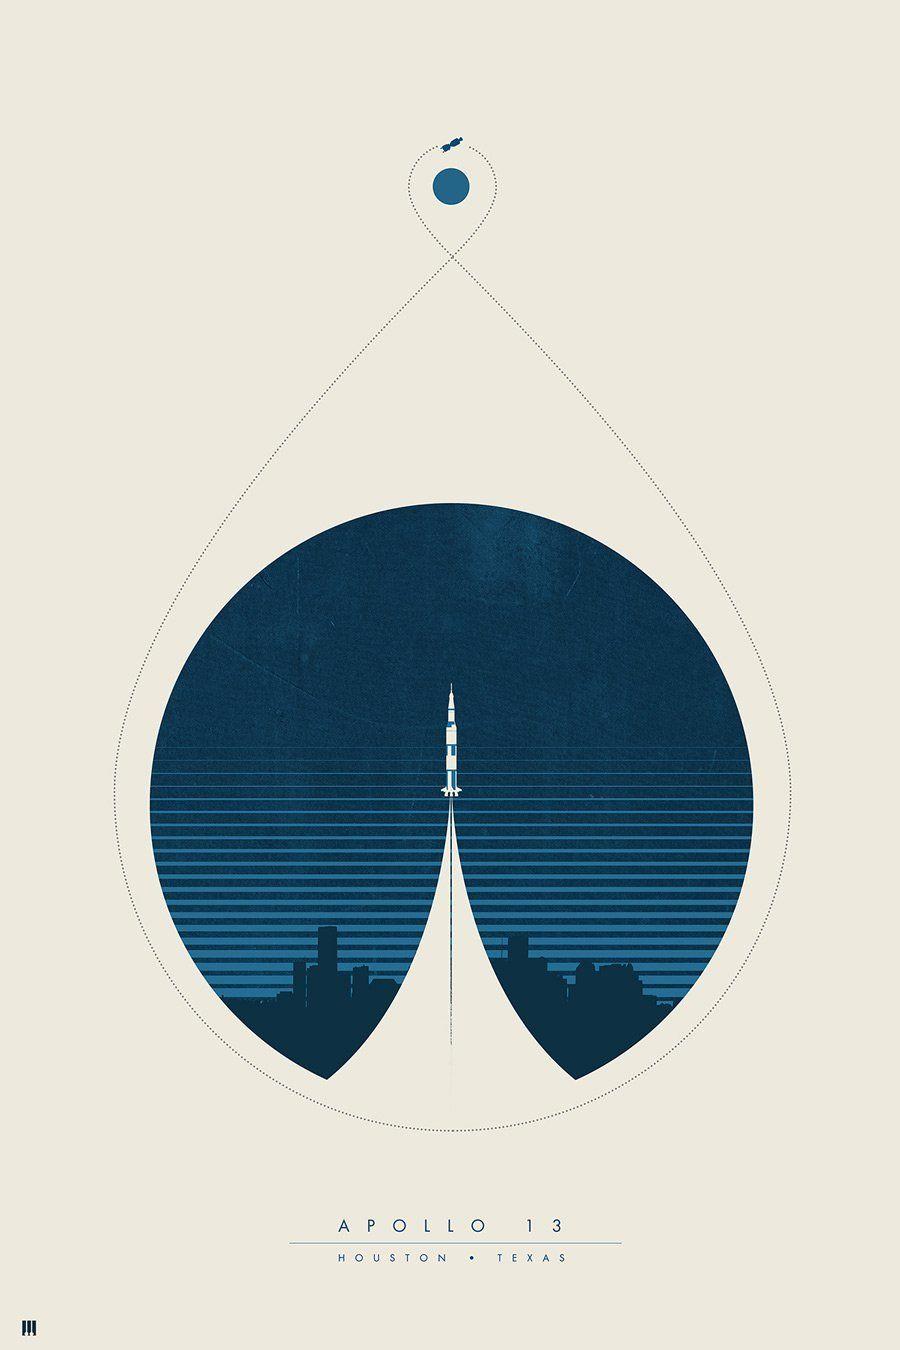 Apollo 12 Houston Texas Graphic Design Space Poster Featured